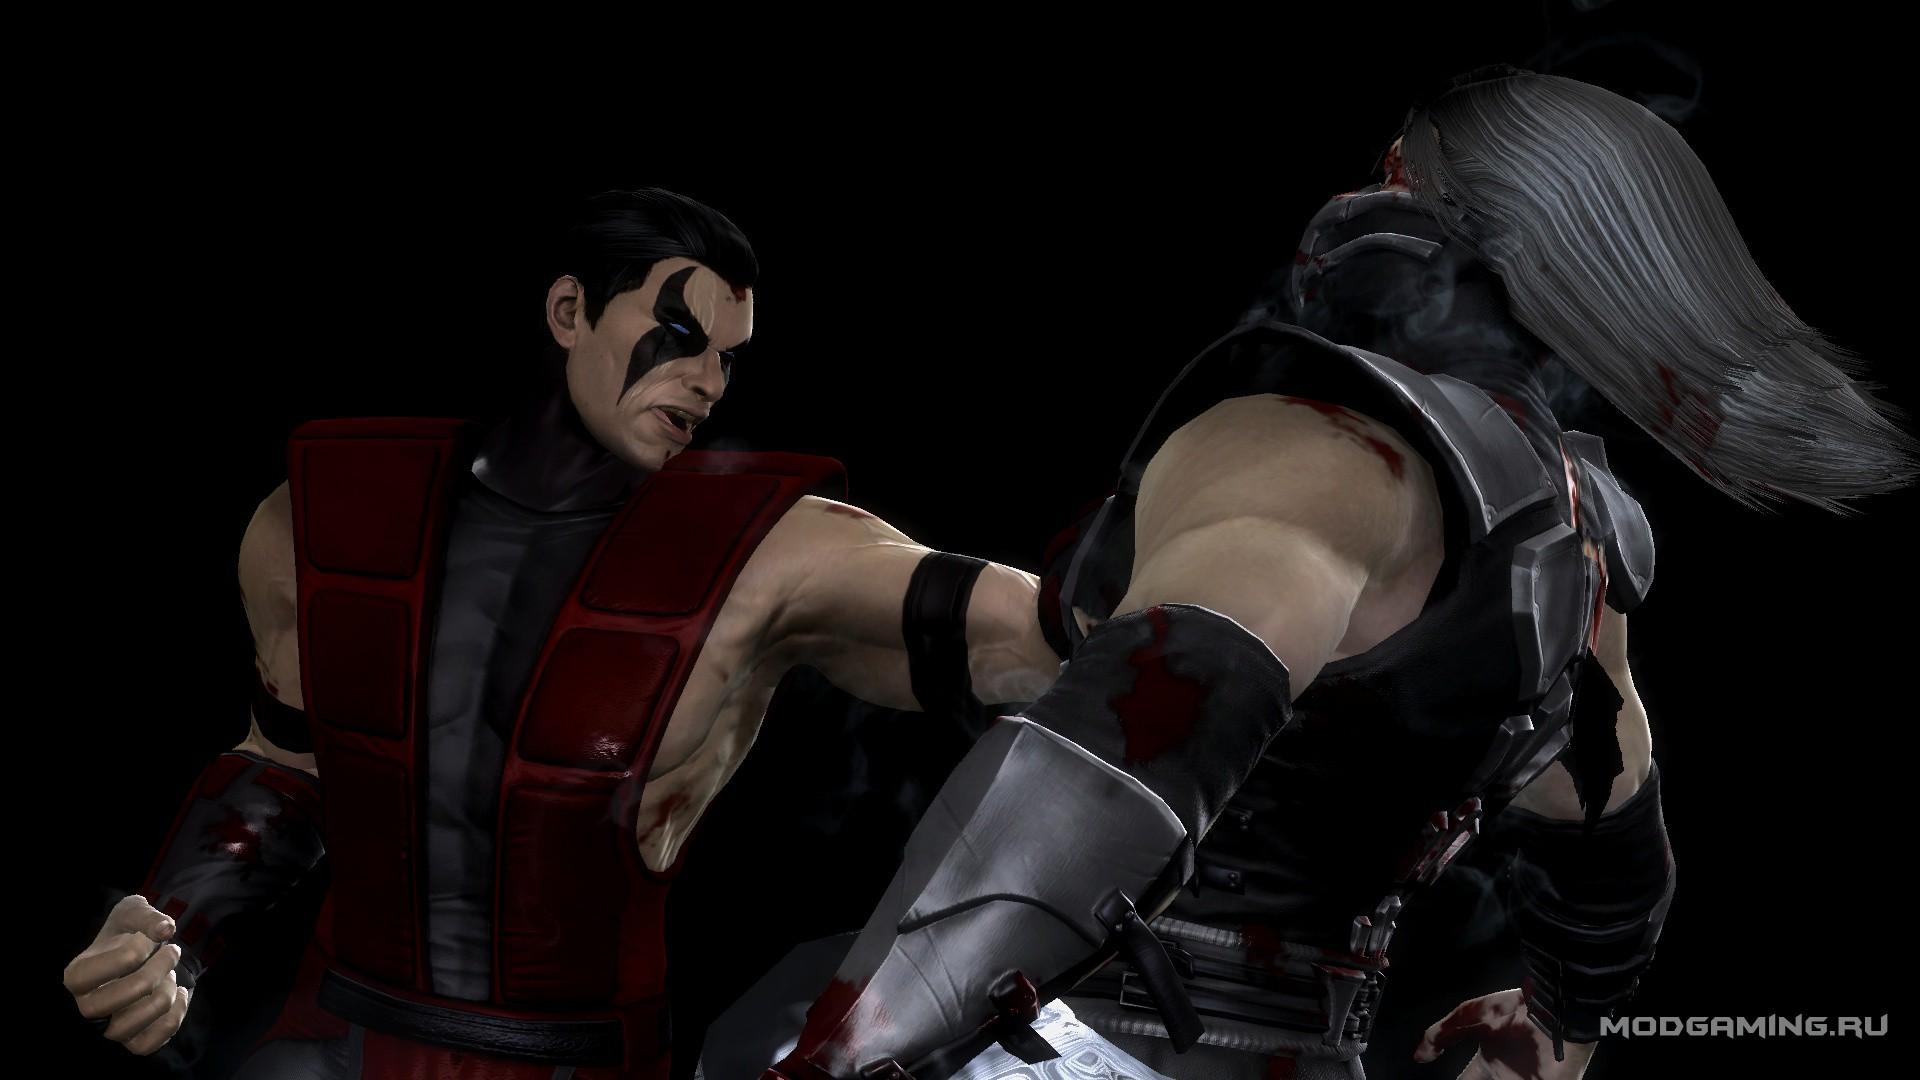 Mortal kombat komplete porn sexy image